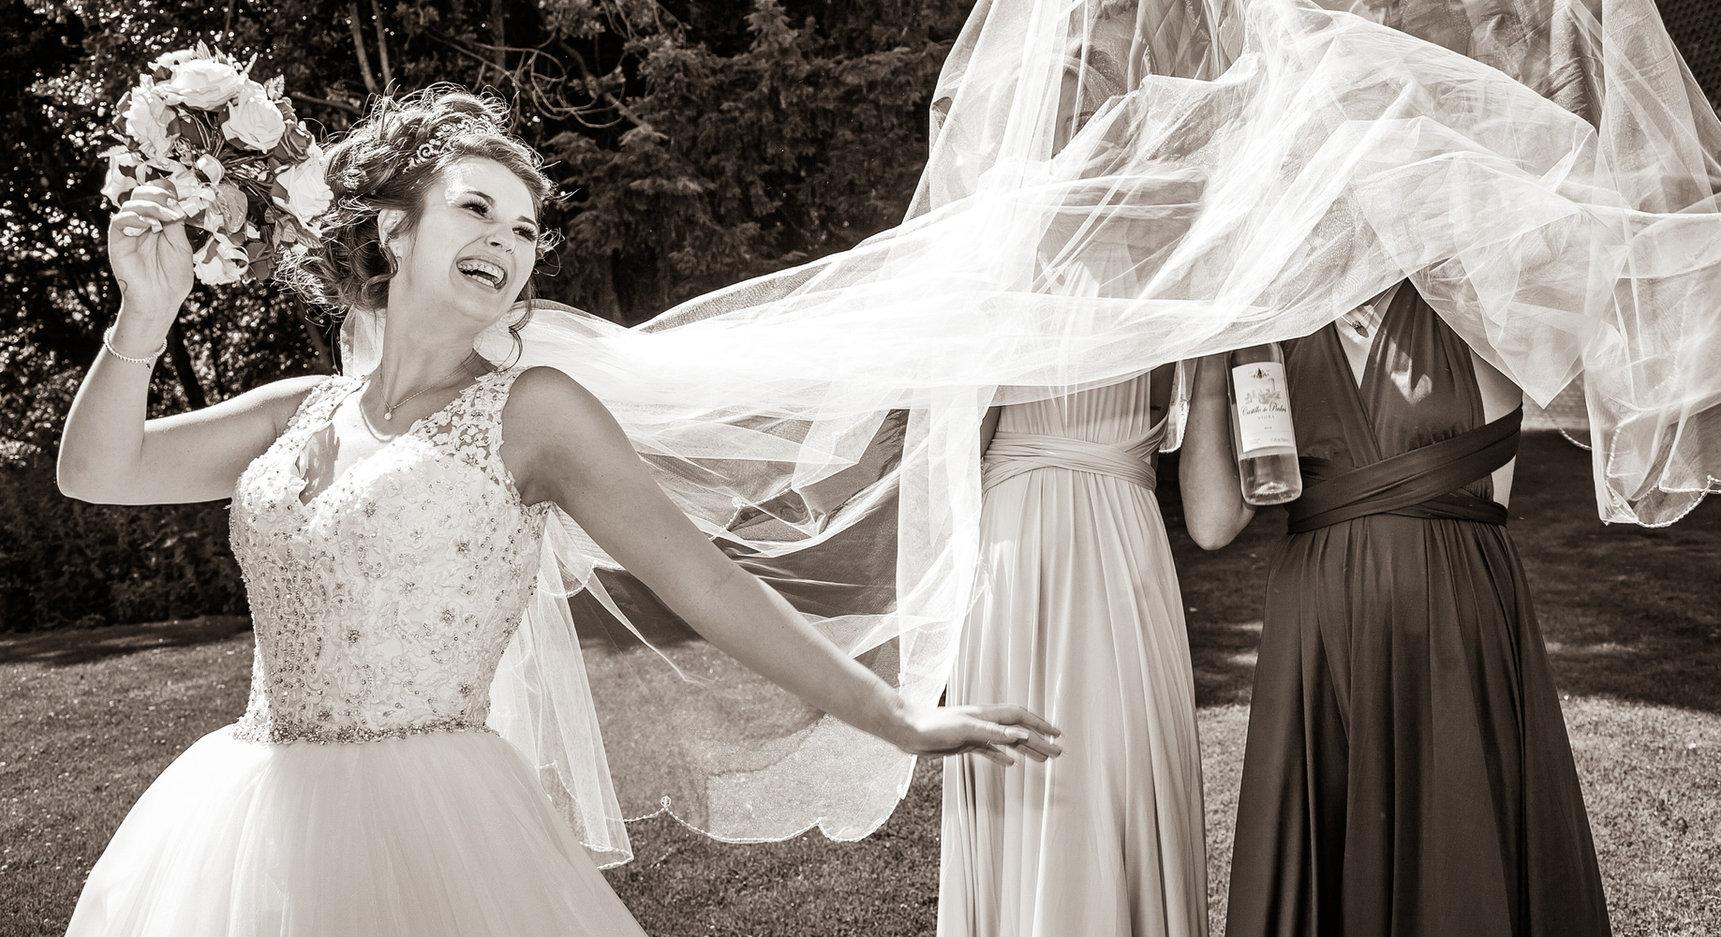 Bride haveing fun